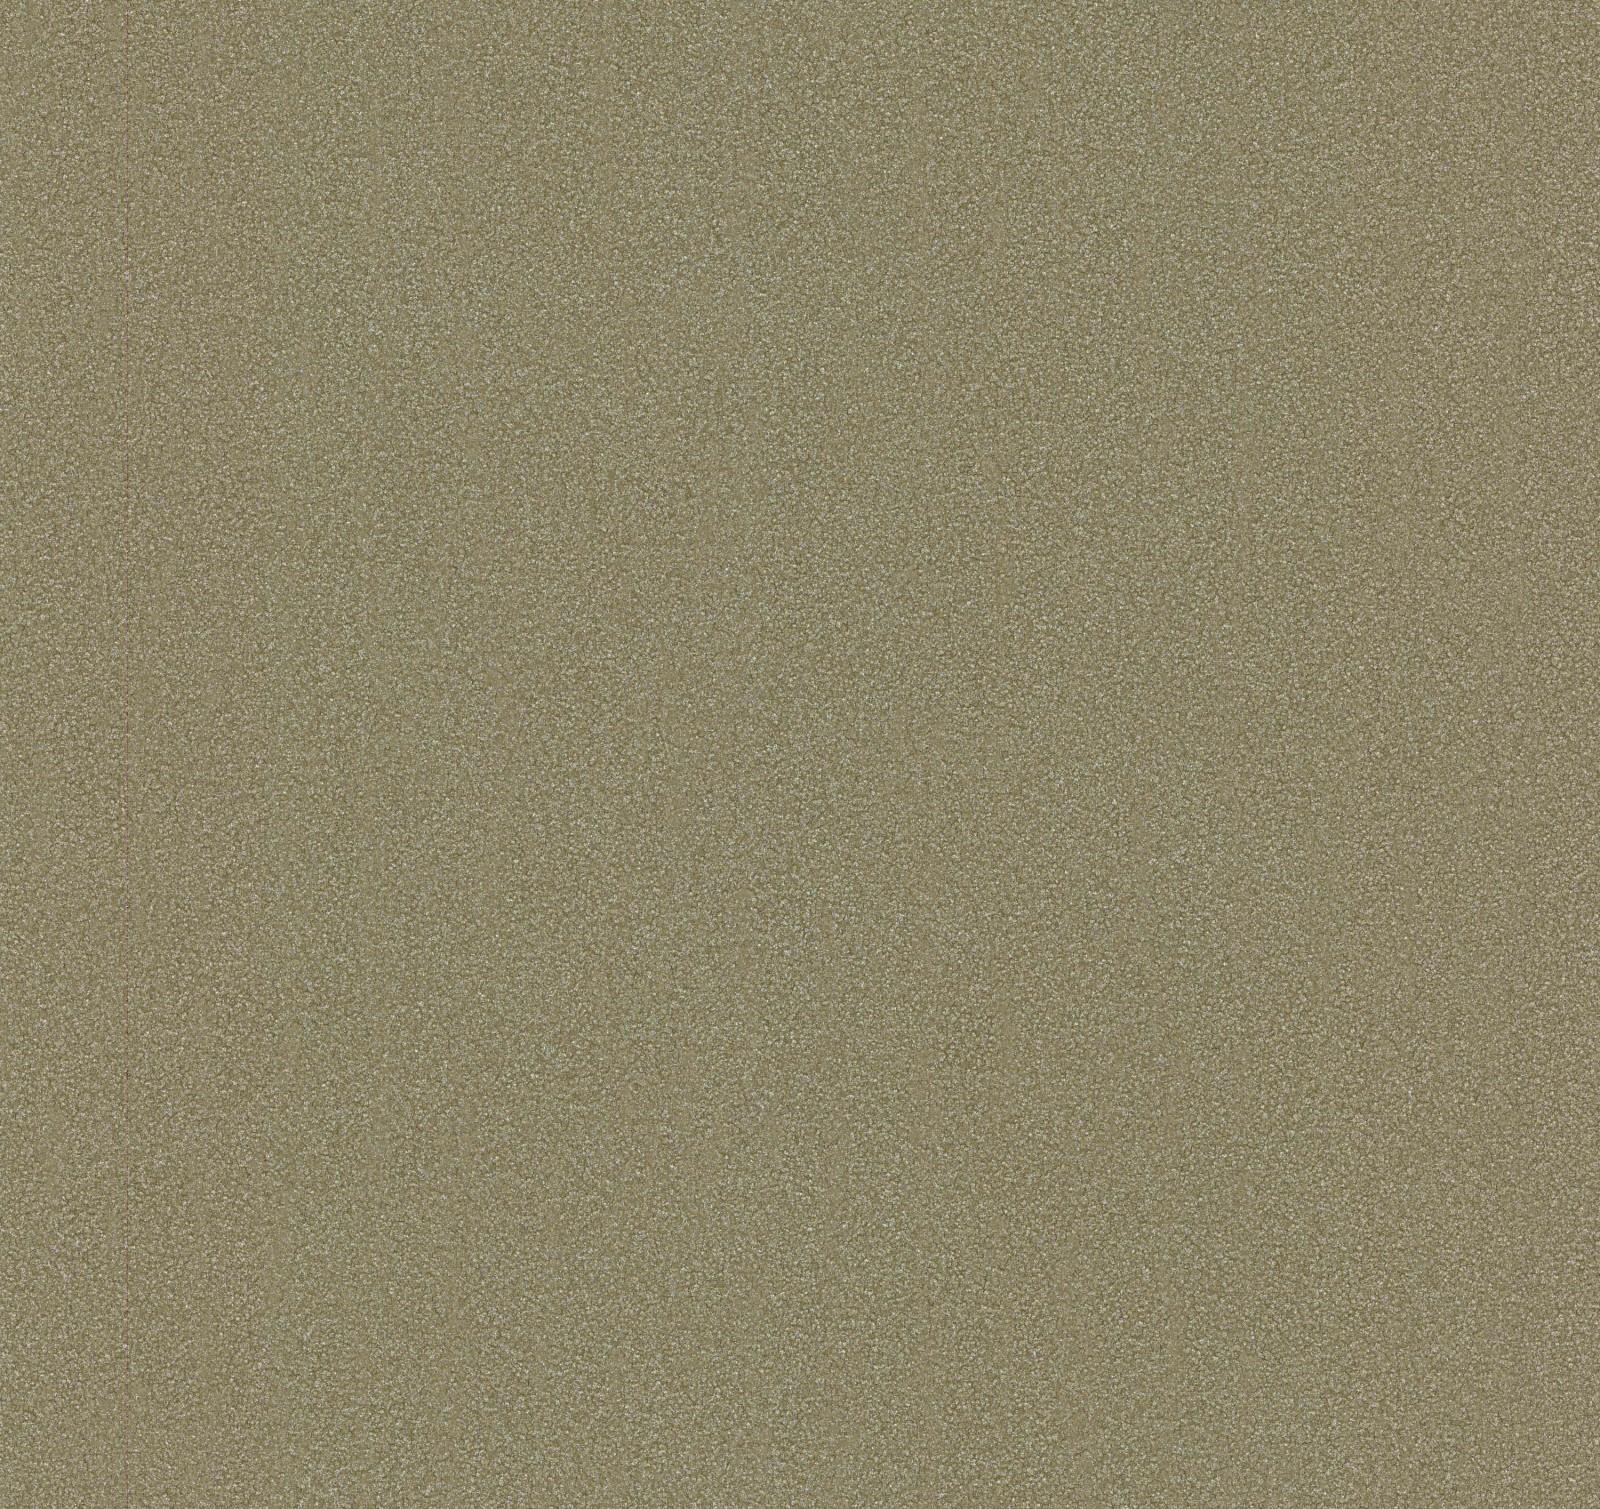 Tapete uni braun glitzer carat ps 13348 50 for Tapete braun glitzer